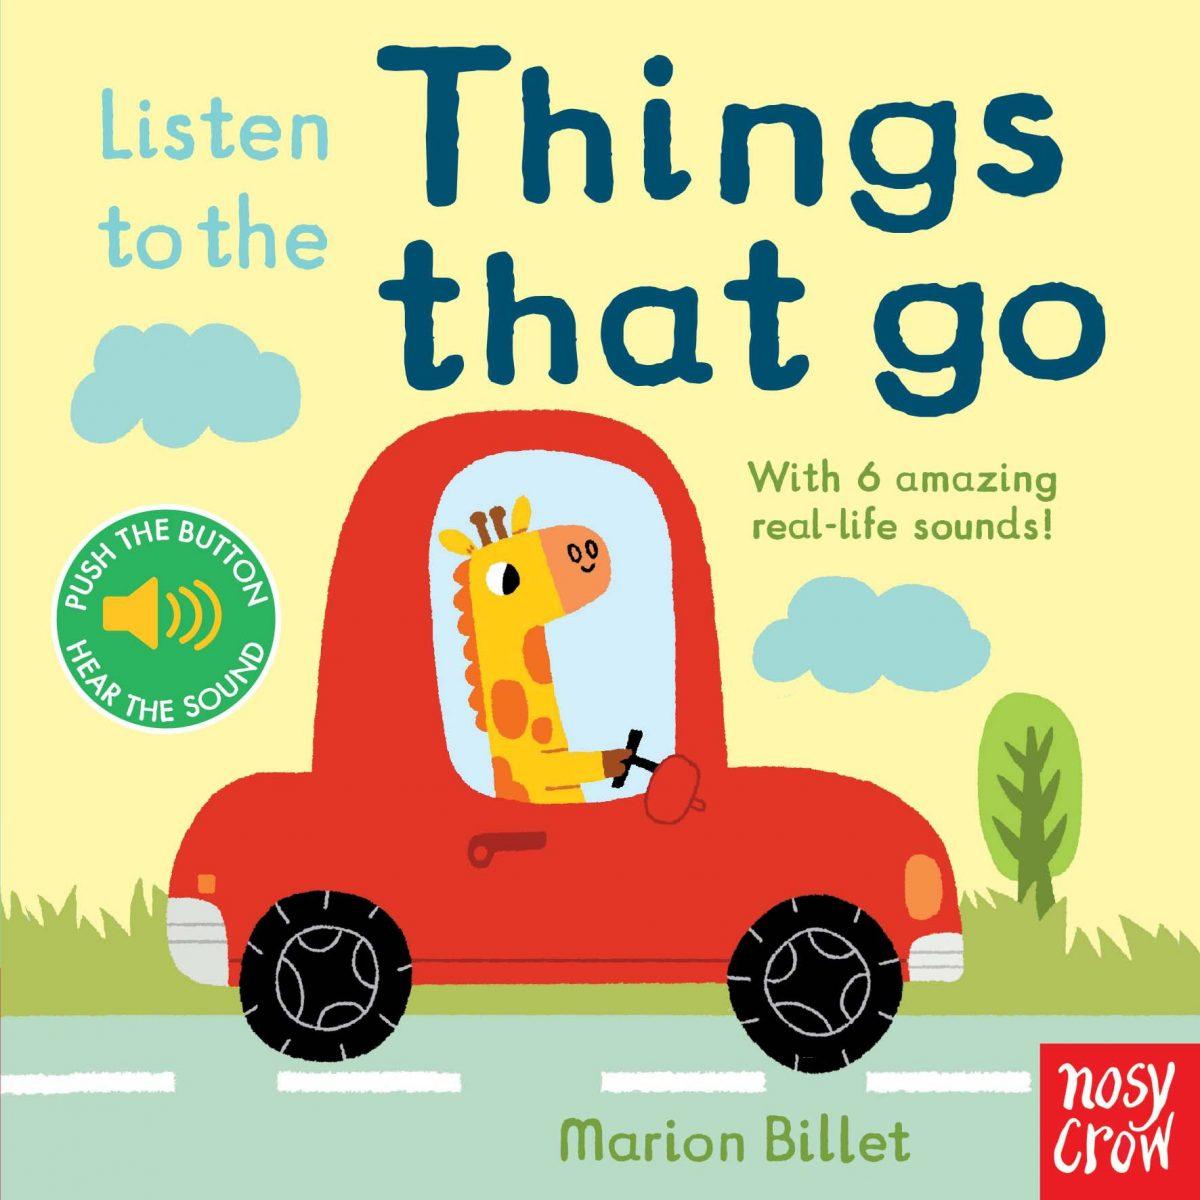 cartoon giraffe driving a red car